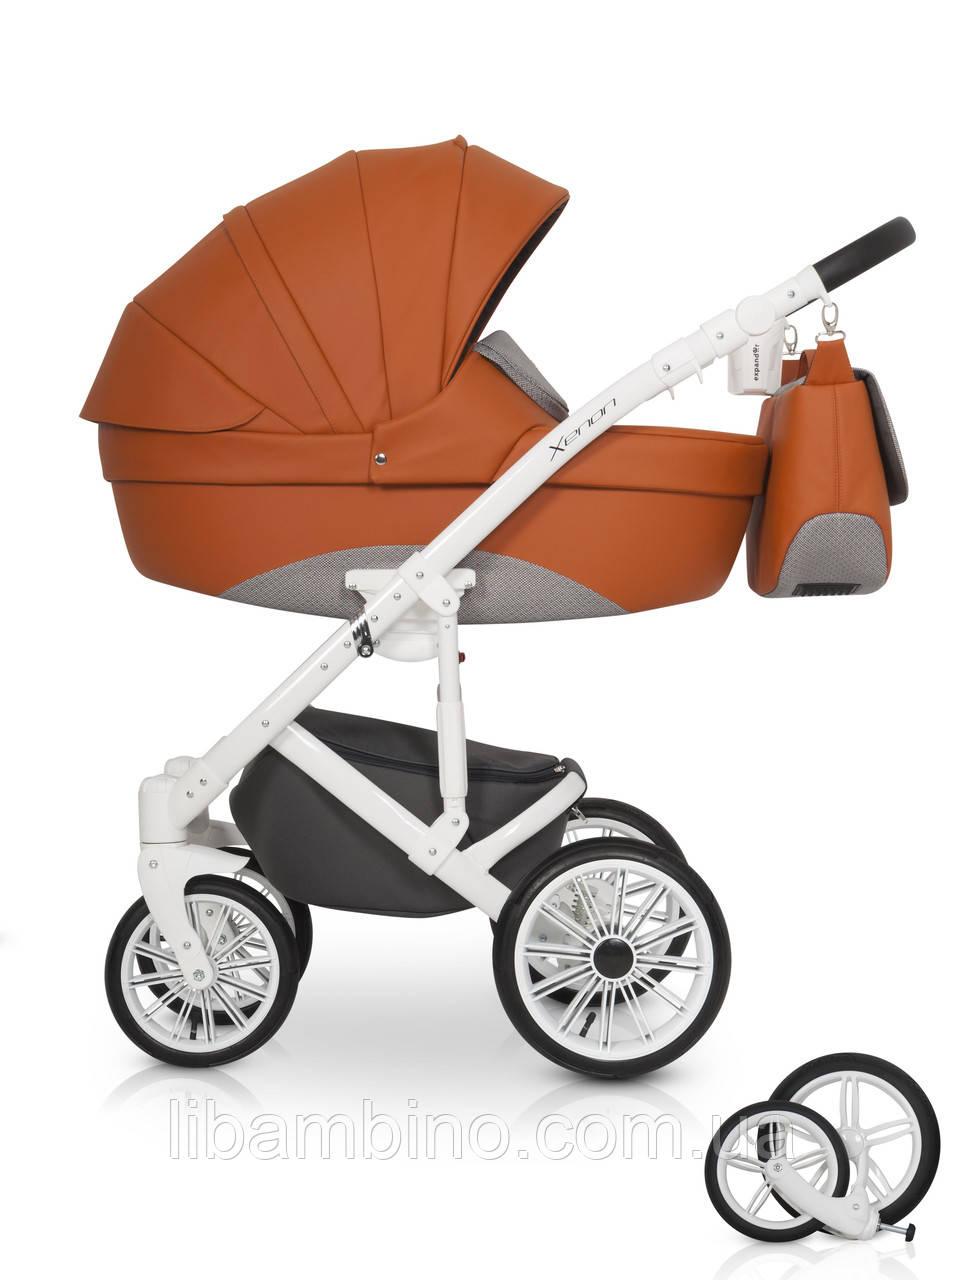 Дитяча універсальна коляска 2 в 1 Expander Xenon 02 Copper